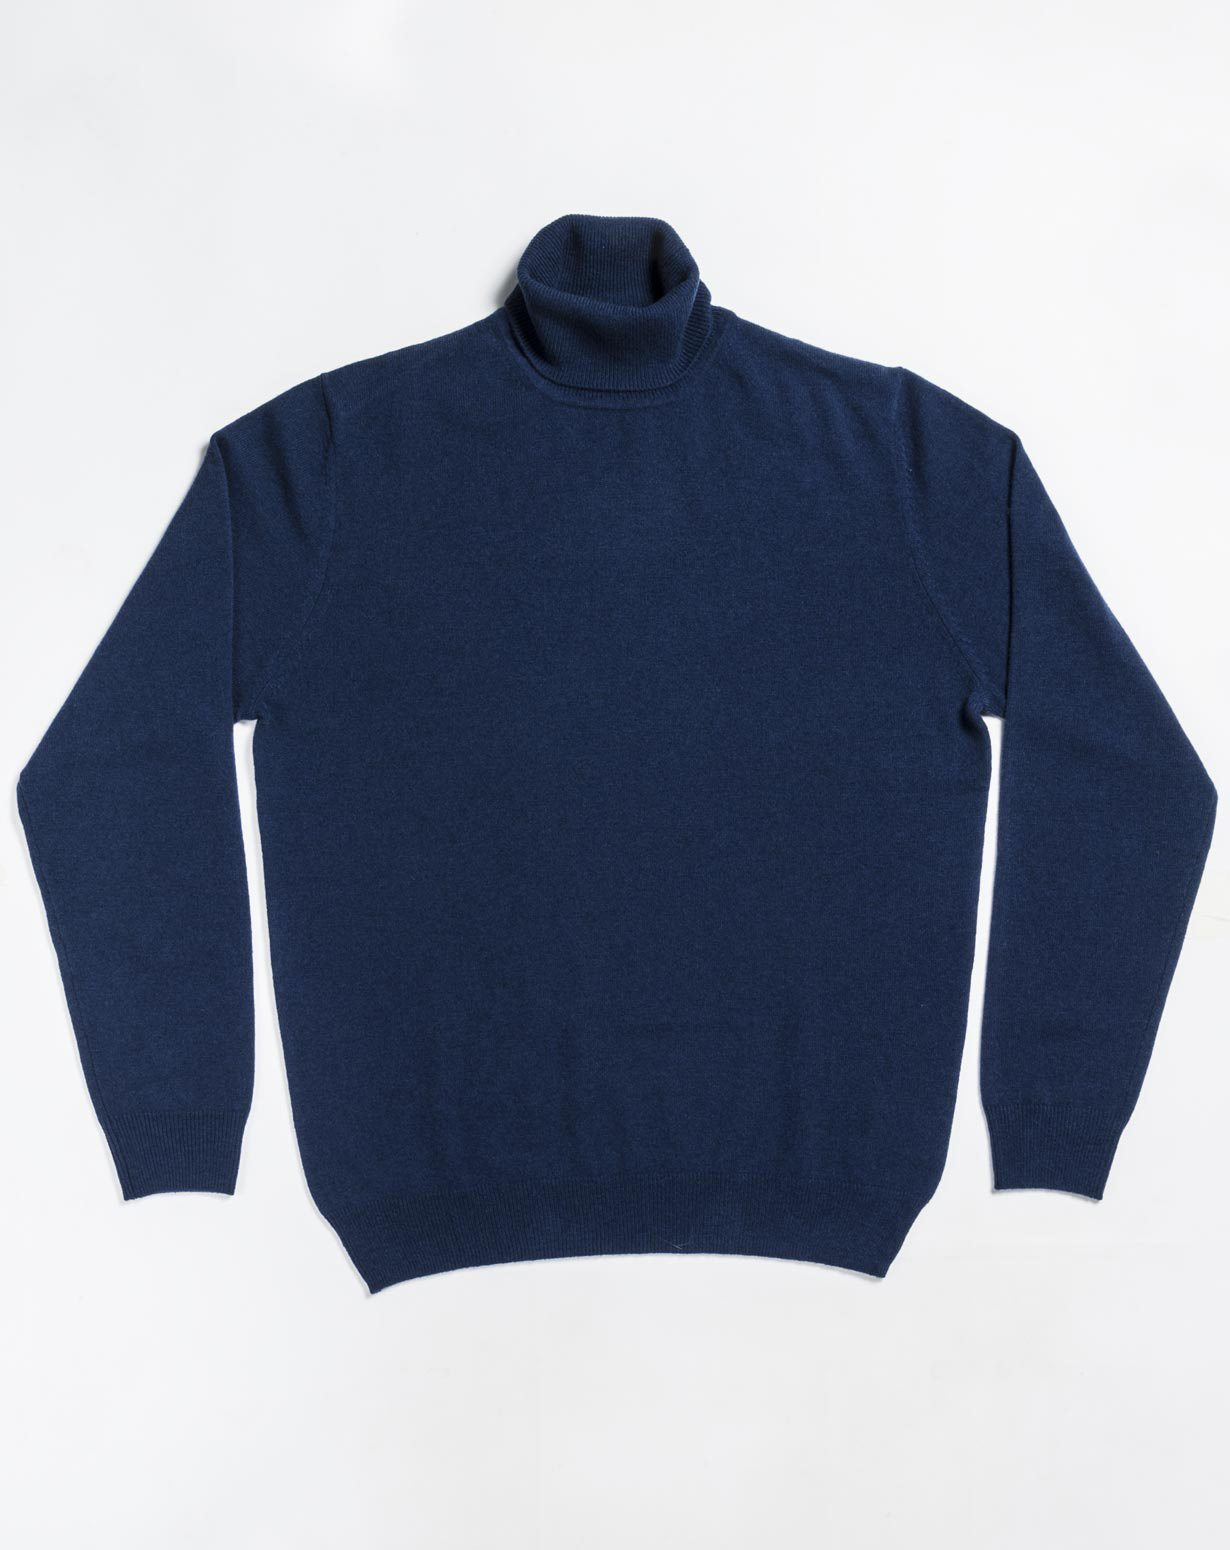 Men's Custom Knit Turtleneck | MaisonCashmere